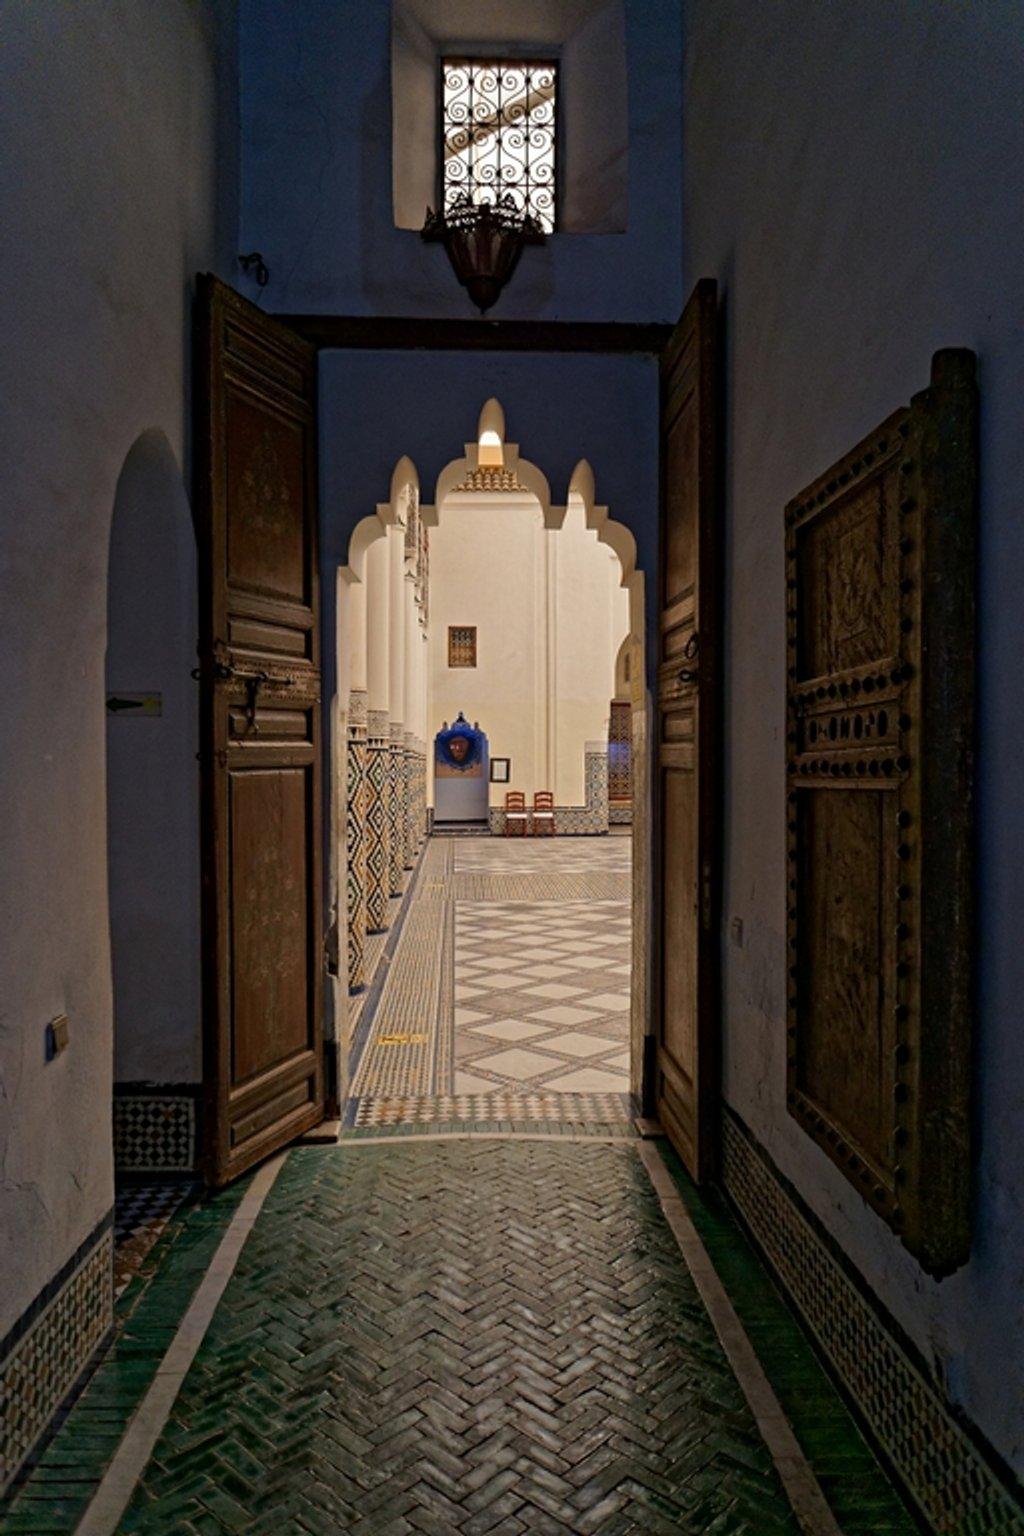 229 - Museum of Marrakech (2) by bob65